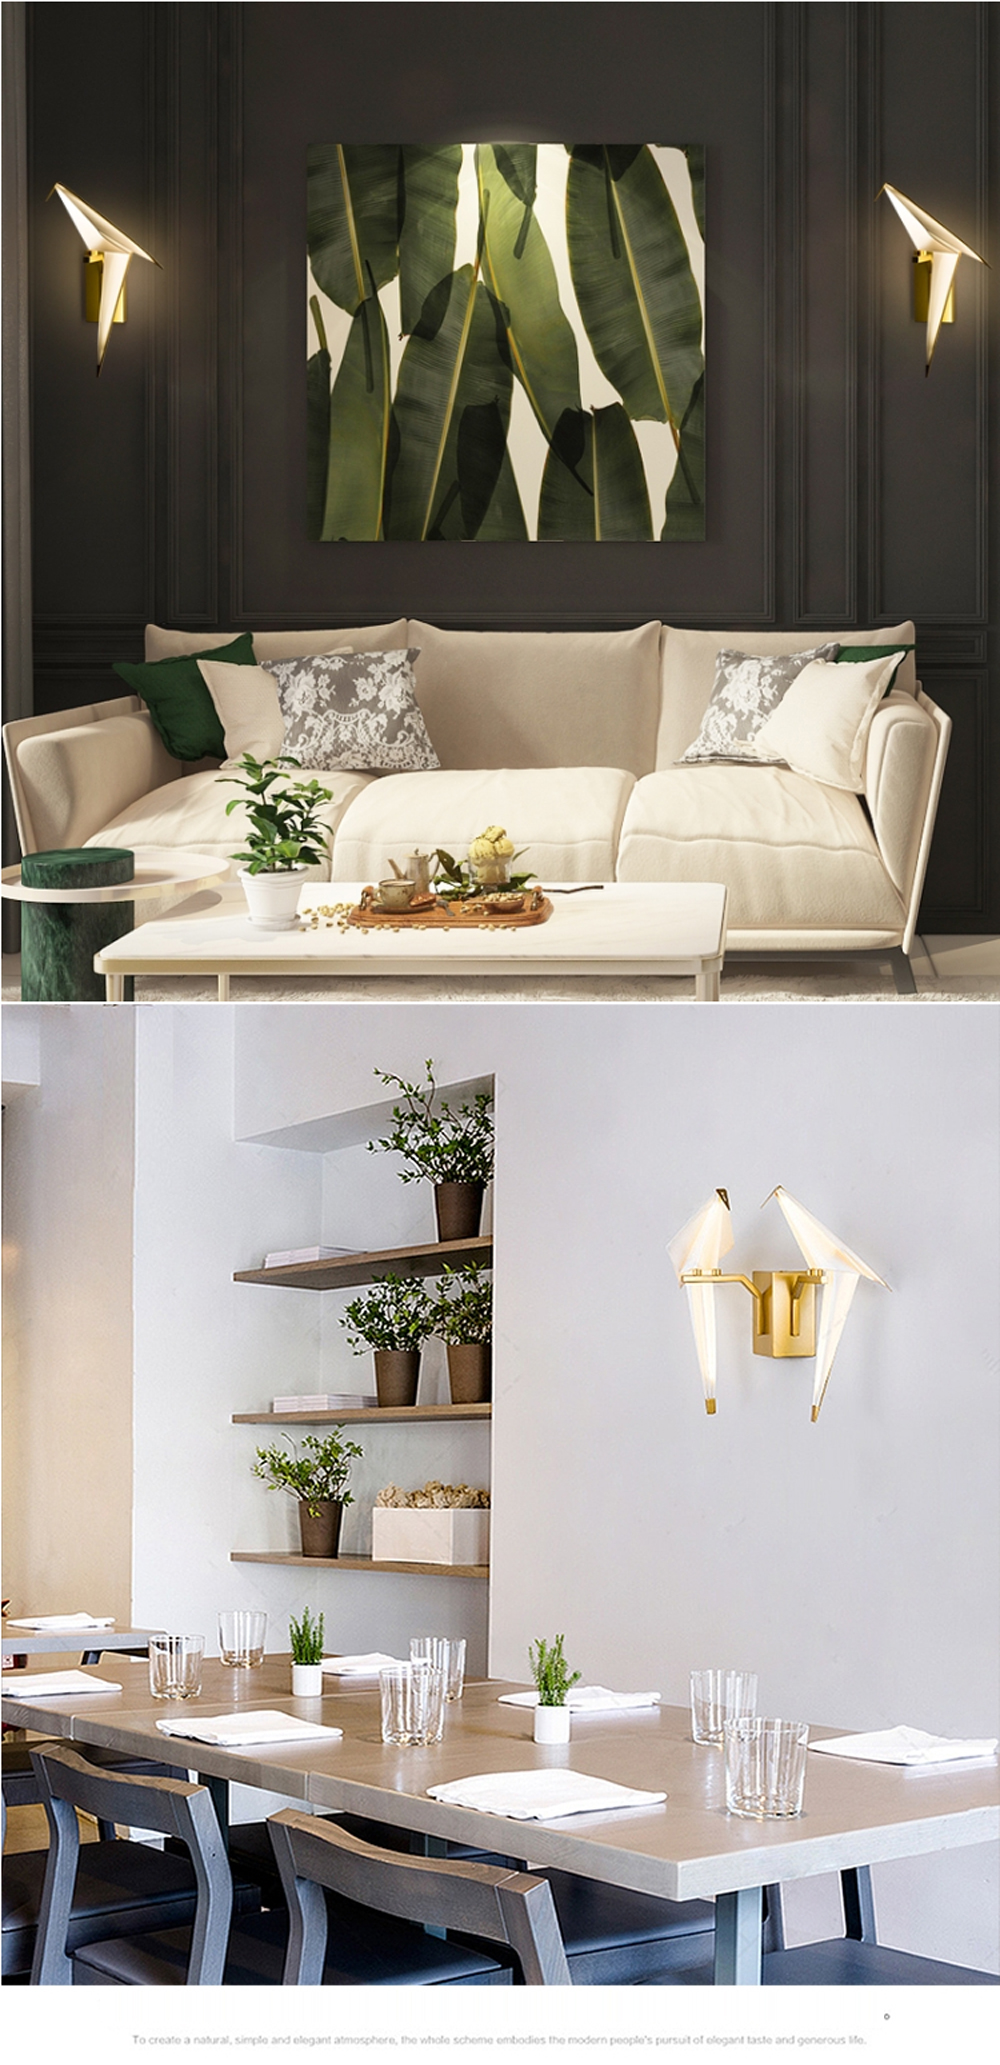 Hc59dc24f6a53495cbe4b9b8cdf5df662M - LED Postmodern Iron Acryl Love Bird LED Lamp LED Light Wall lamp Wall Light Wall Sconce For Bedroom Corridor